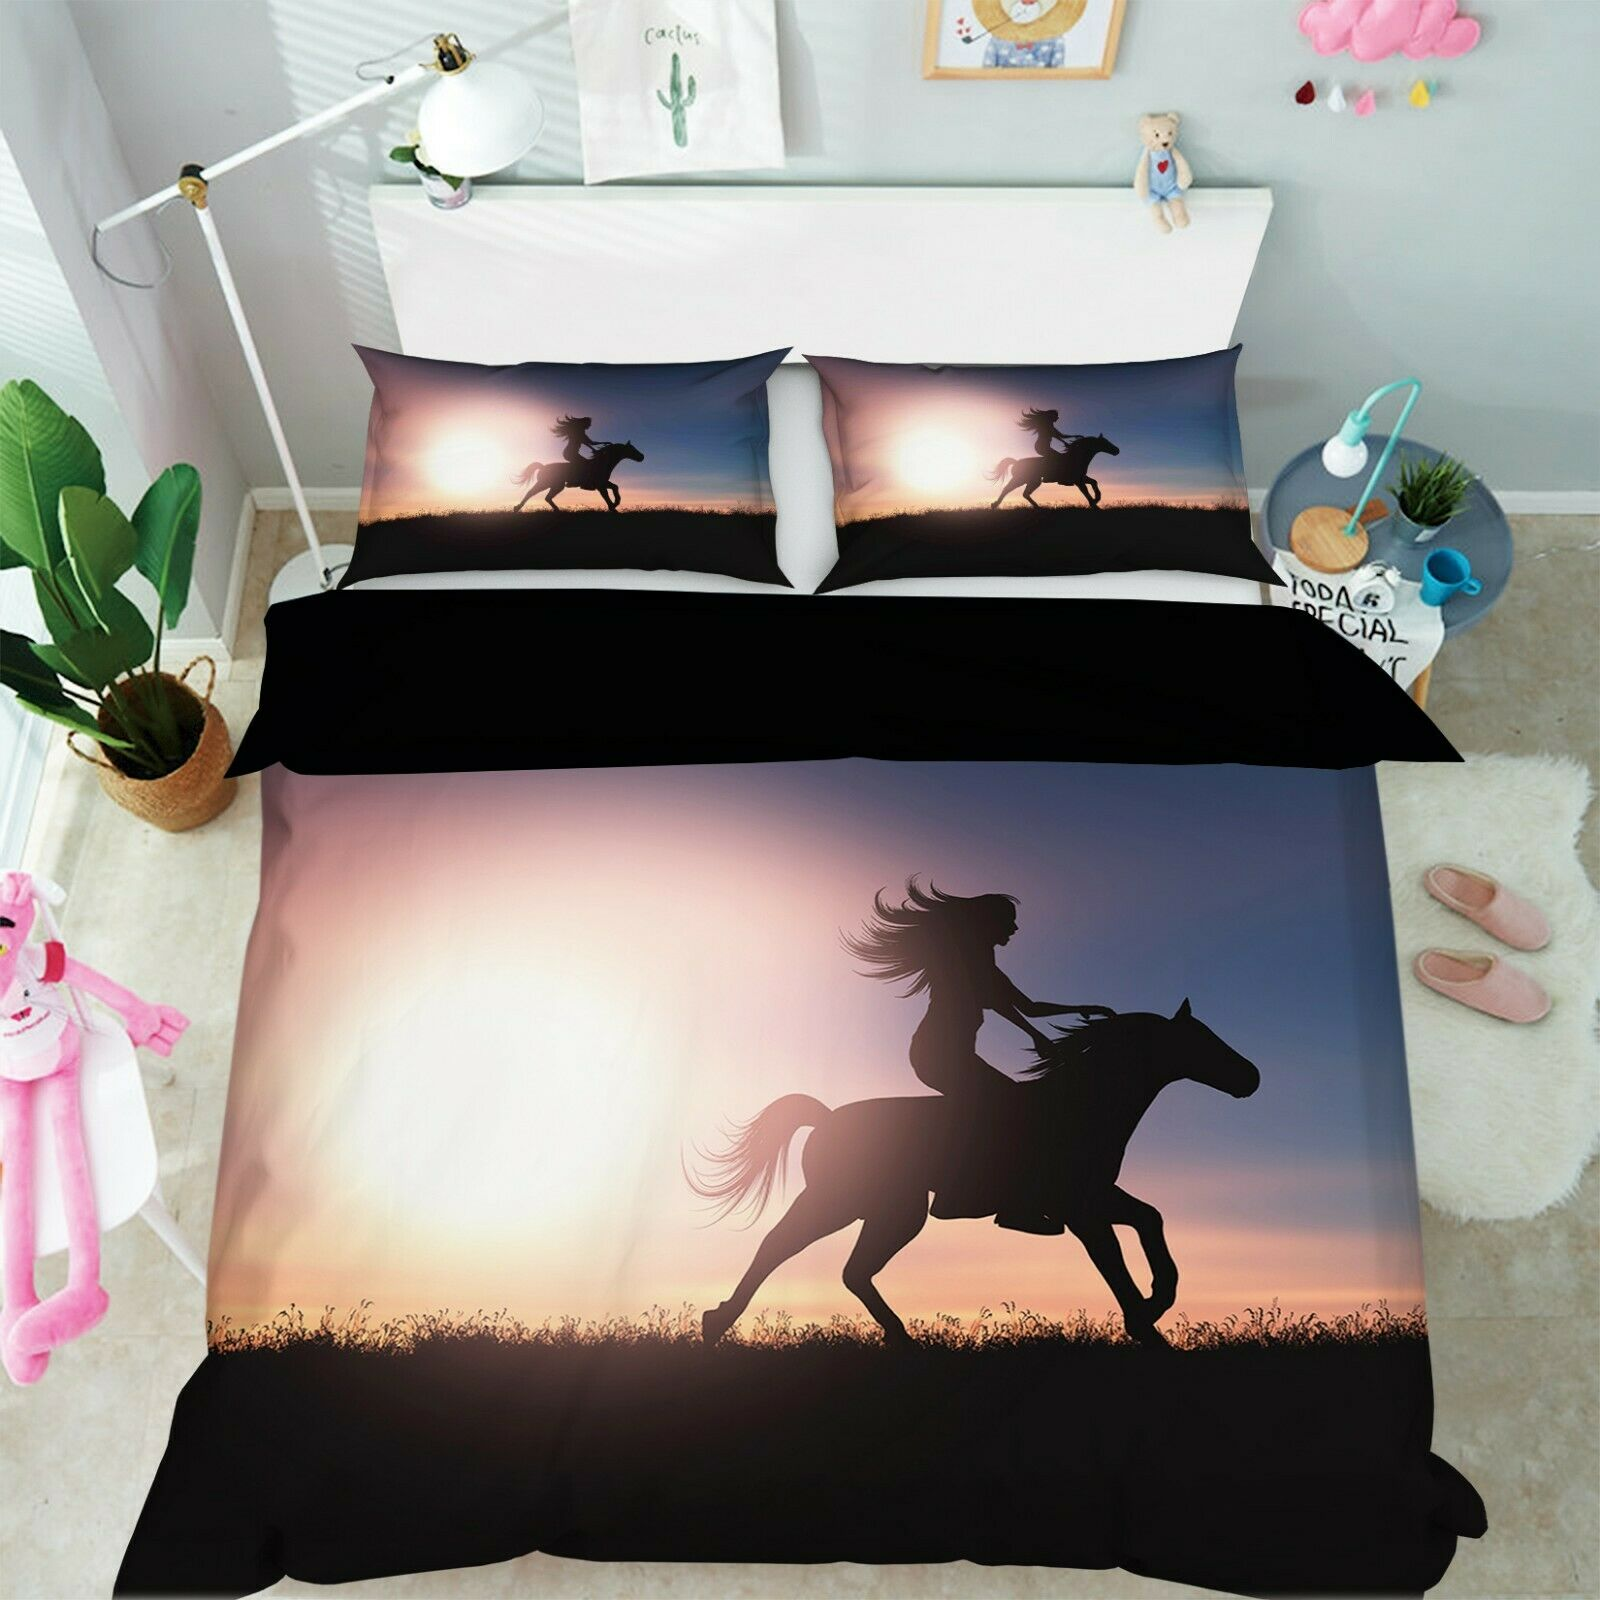 3D Horse Sunlight G05 Animal Bed Pillowcases Quilt Duvet Cover Set Queen King We